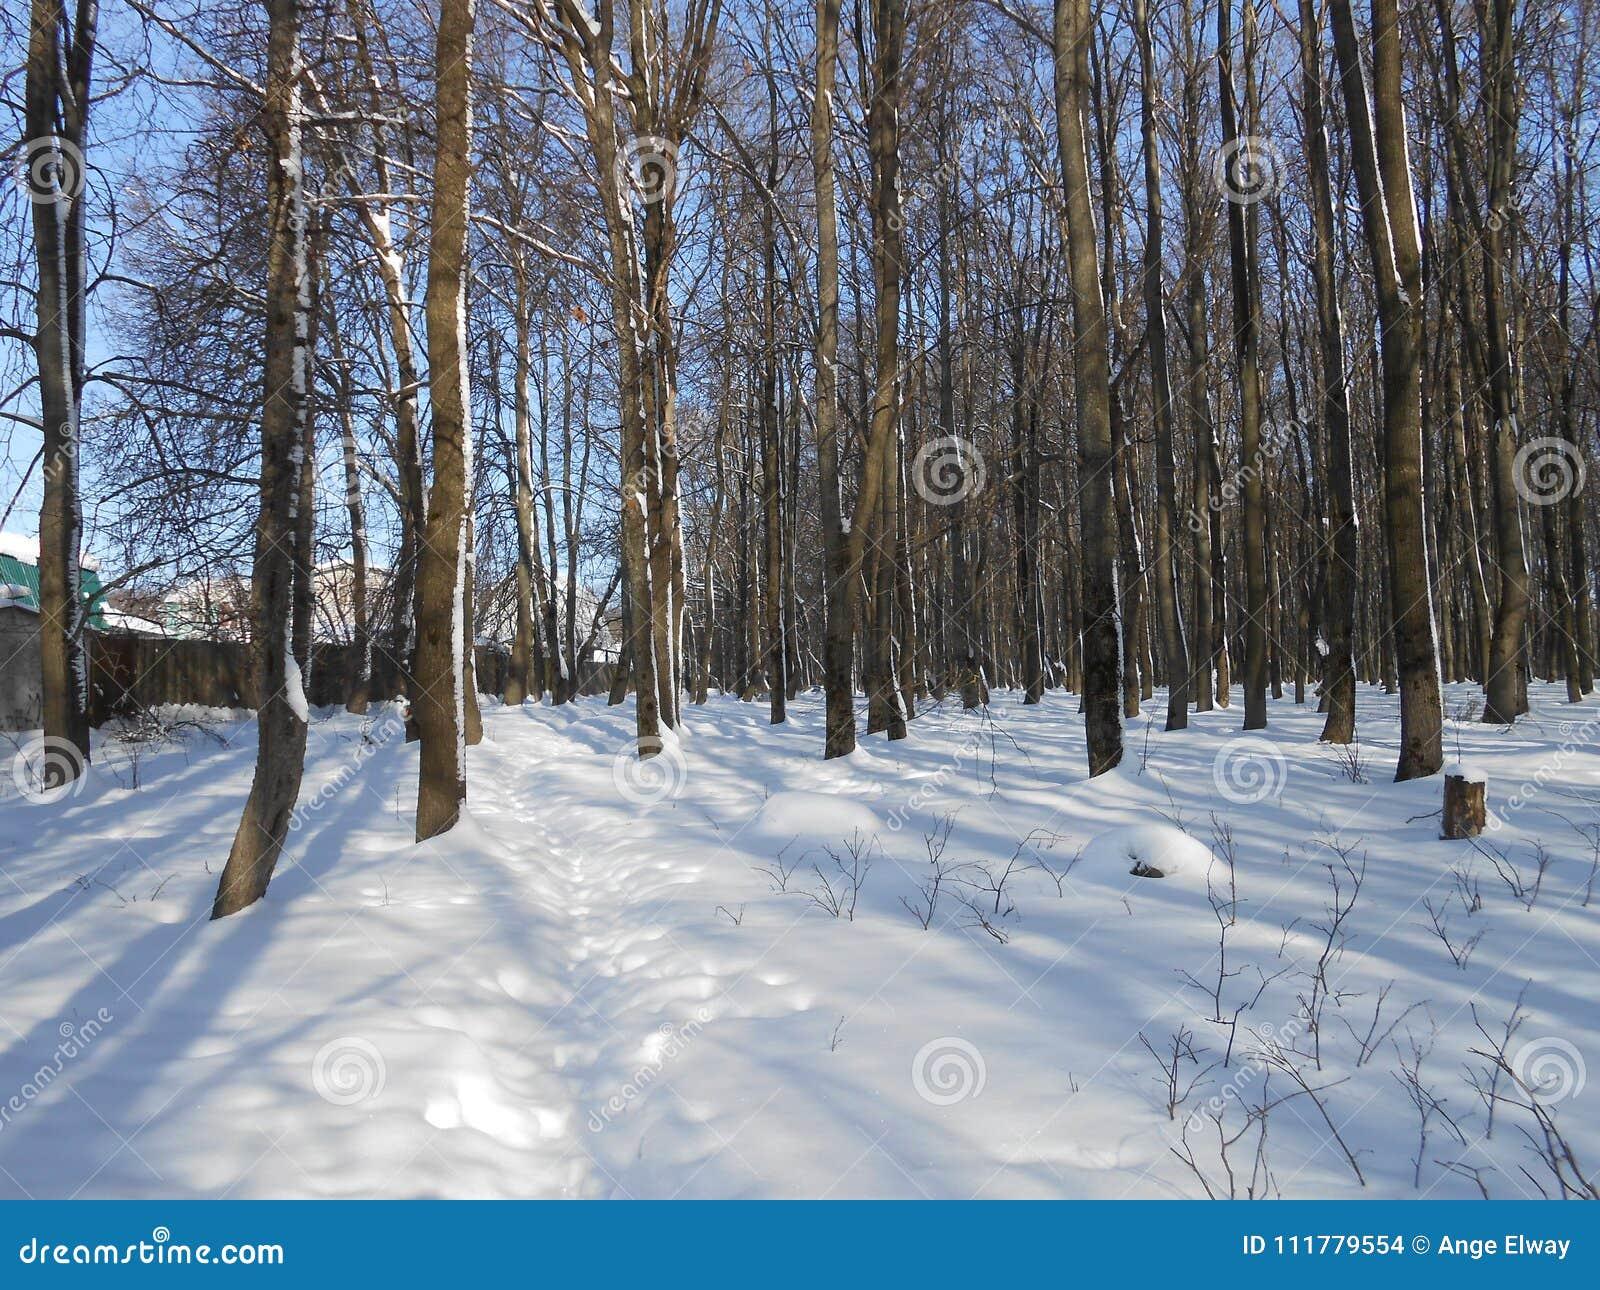 Winter in the oak grove.